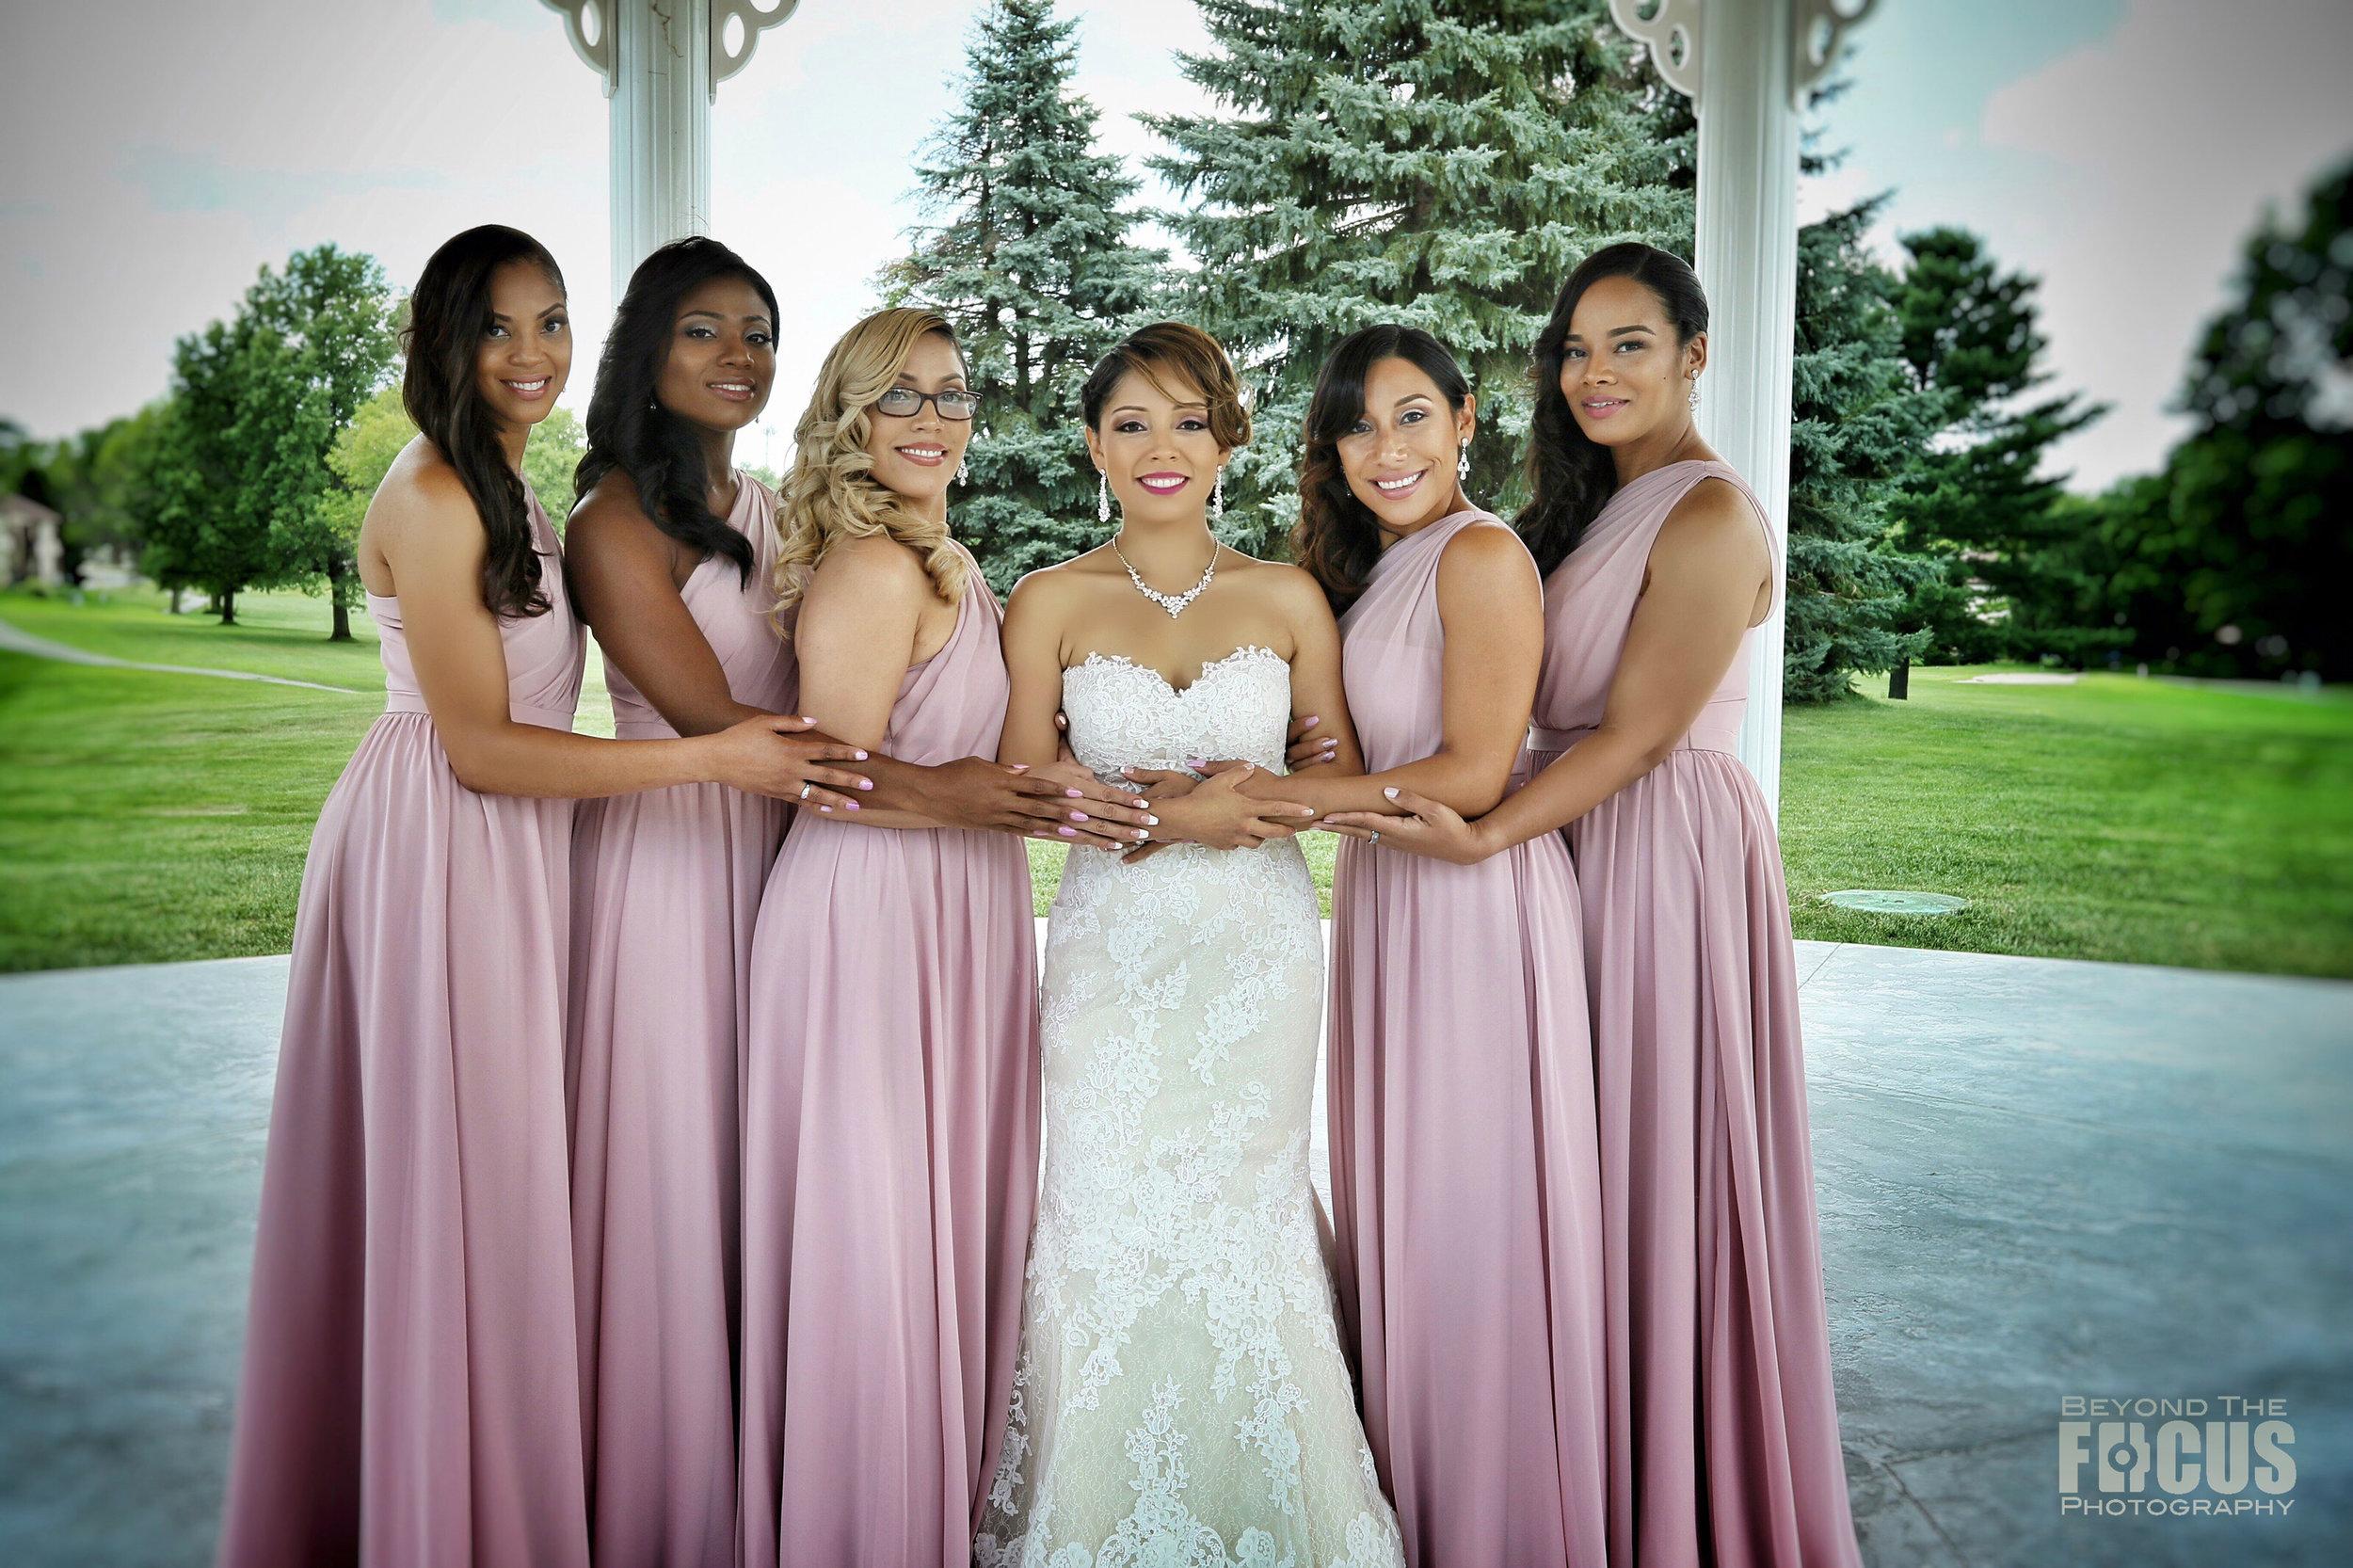 Palmer Wedding - Pre-Wedding Photos 31.jpg